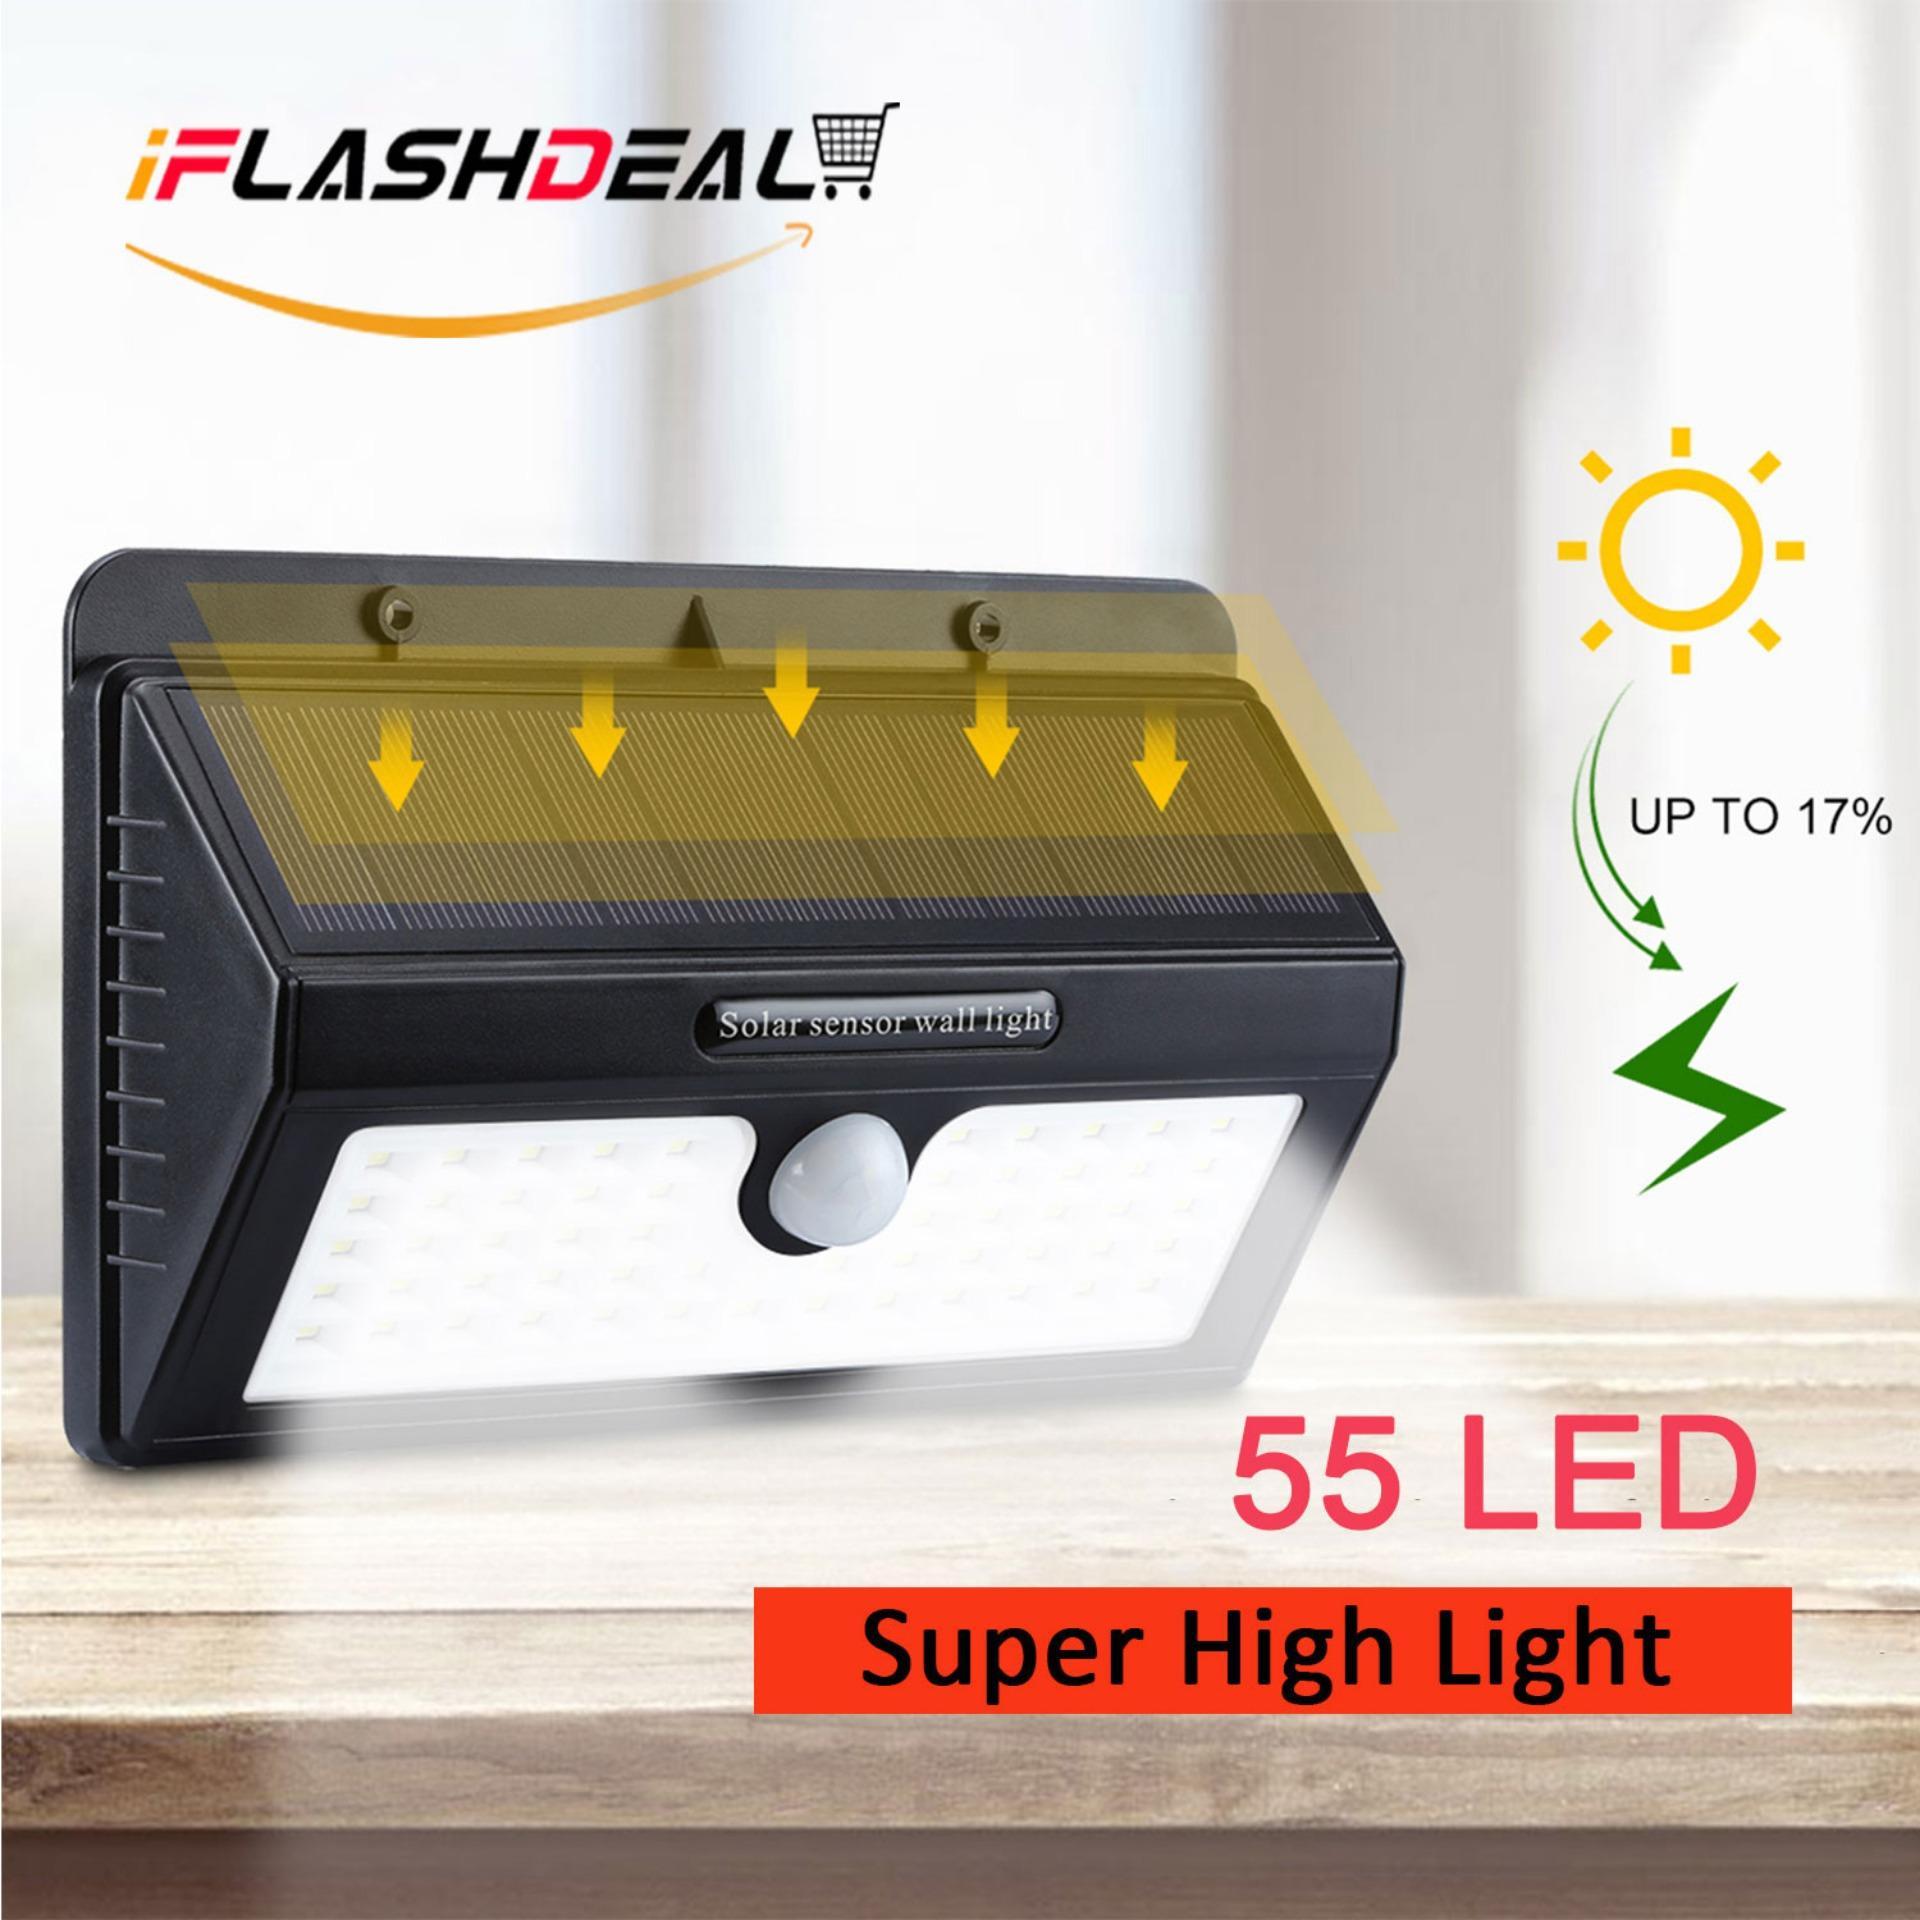 iFlashDeal 55 LED Solar Powered Wall Light Outdoor Lighting Waterproof Wall Lamp Motion Sensor Wireless Security Lights for Driveway Patio Garden Path